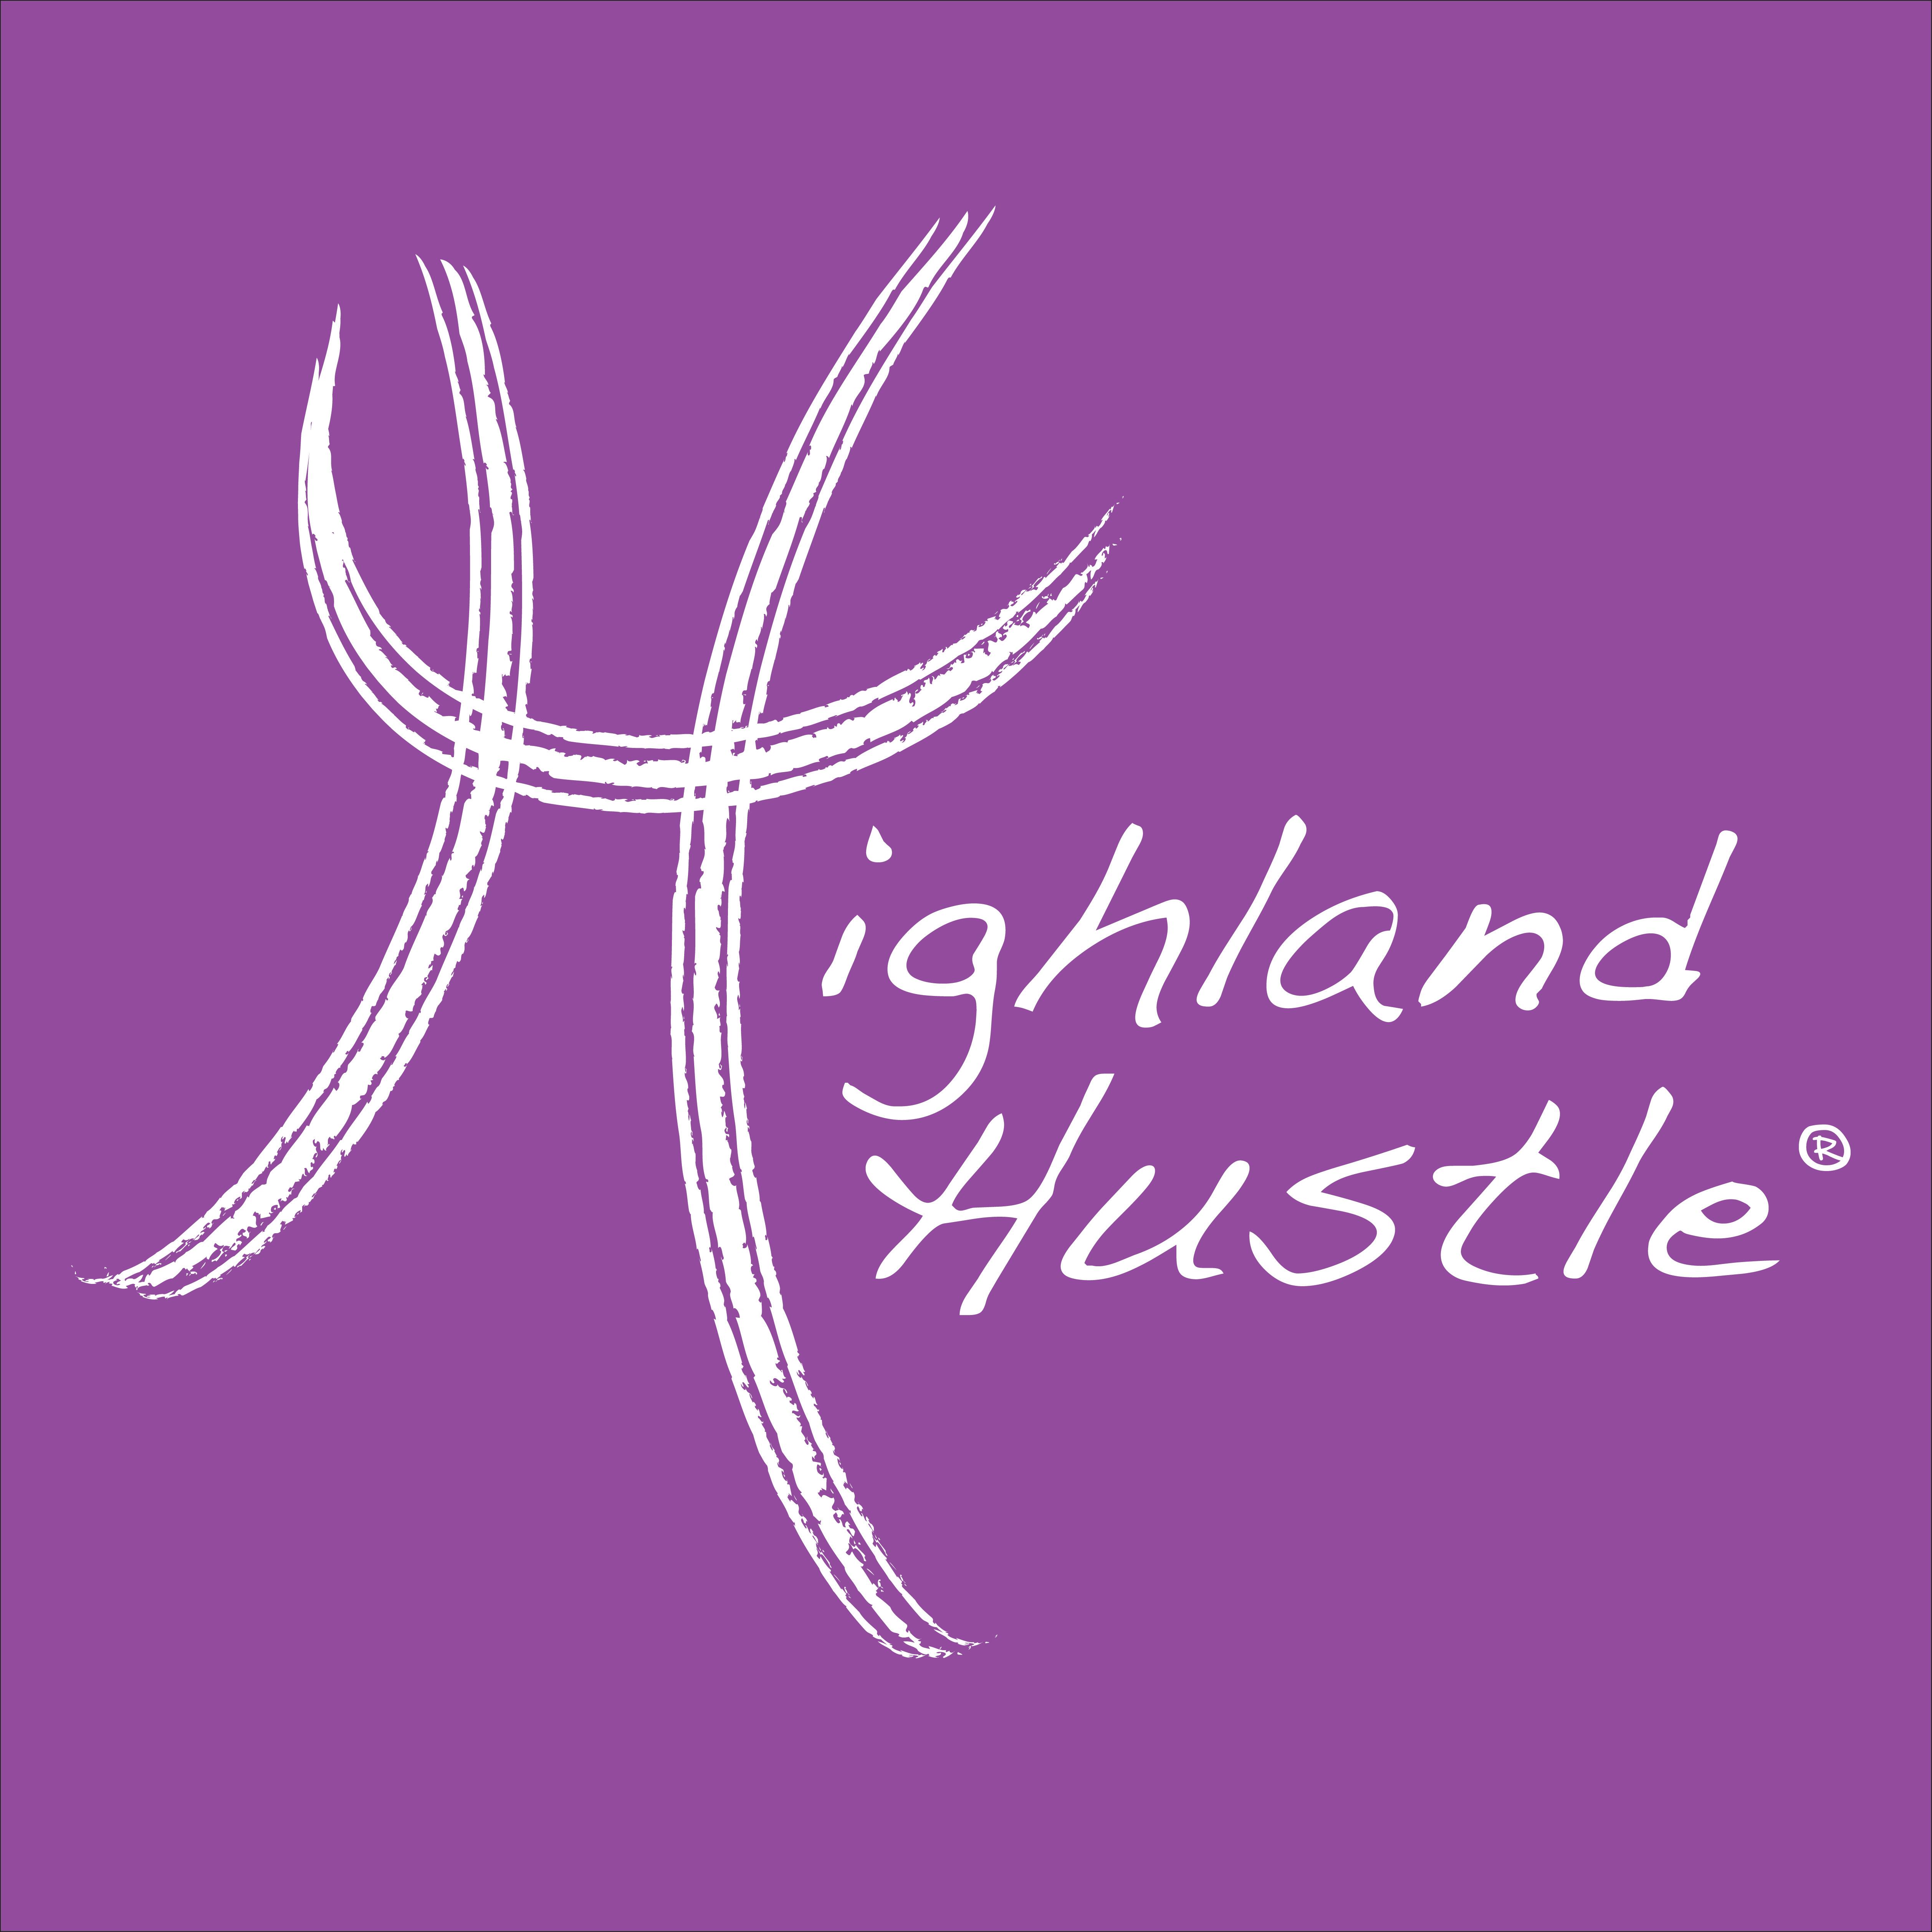 Highland Hustle